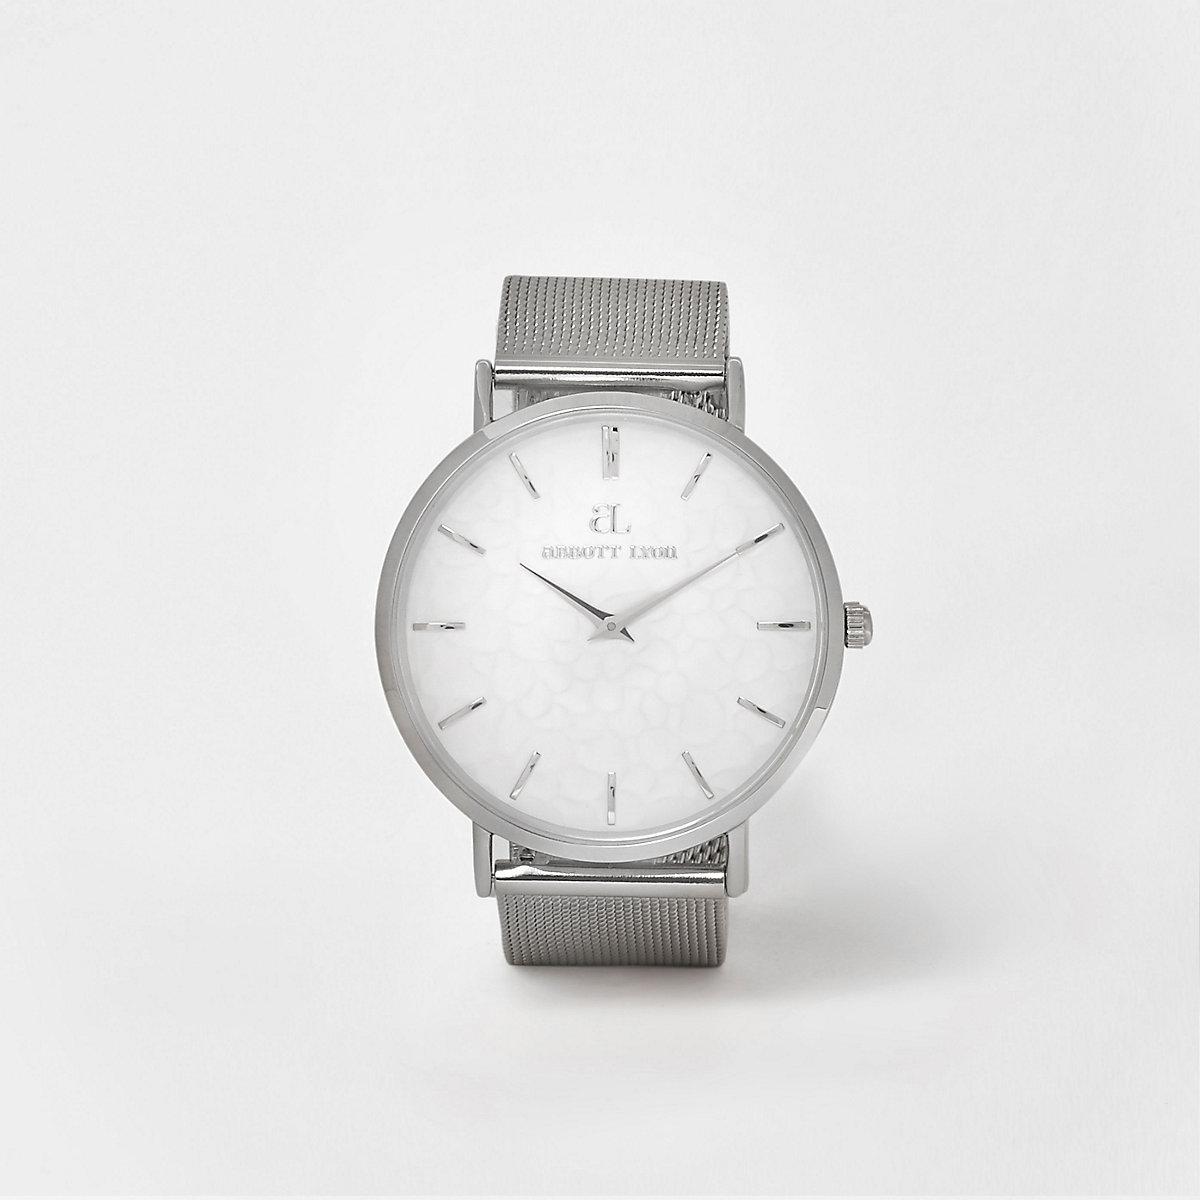 Silver plated Abbott Lyon mesh strap watch